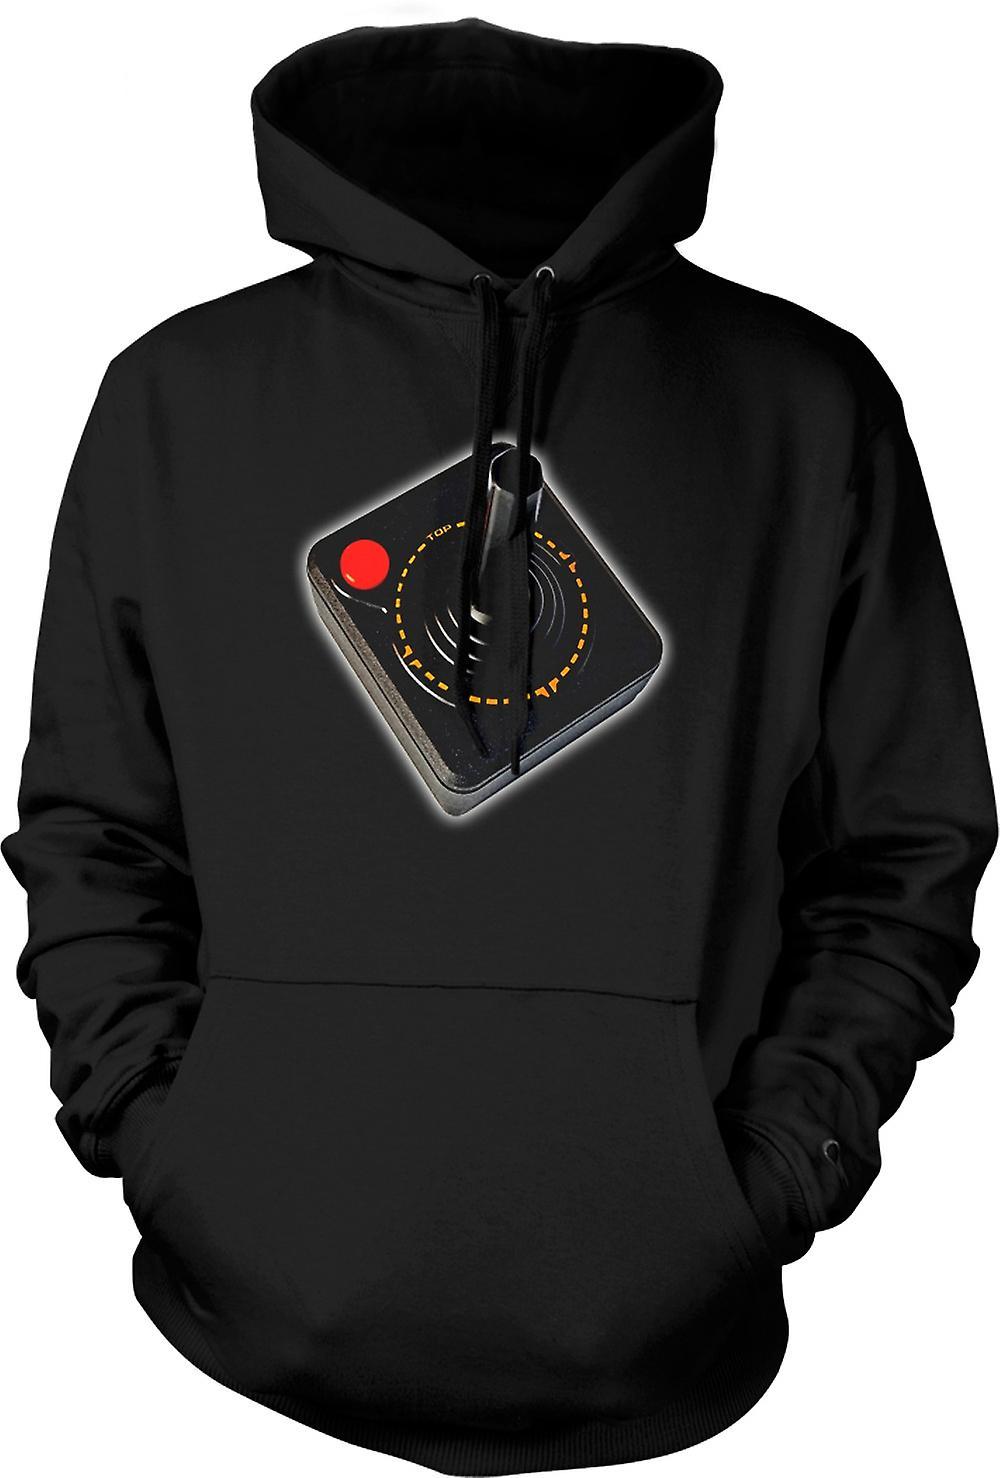 Mens Hoodie - Atari Games Controller - Old School